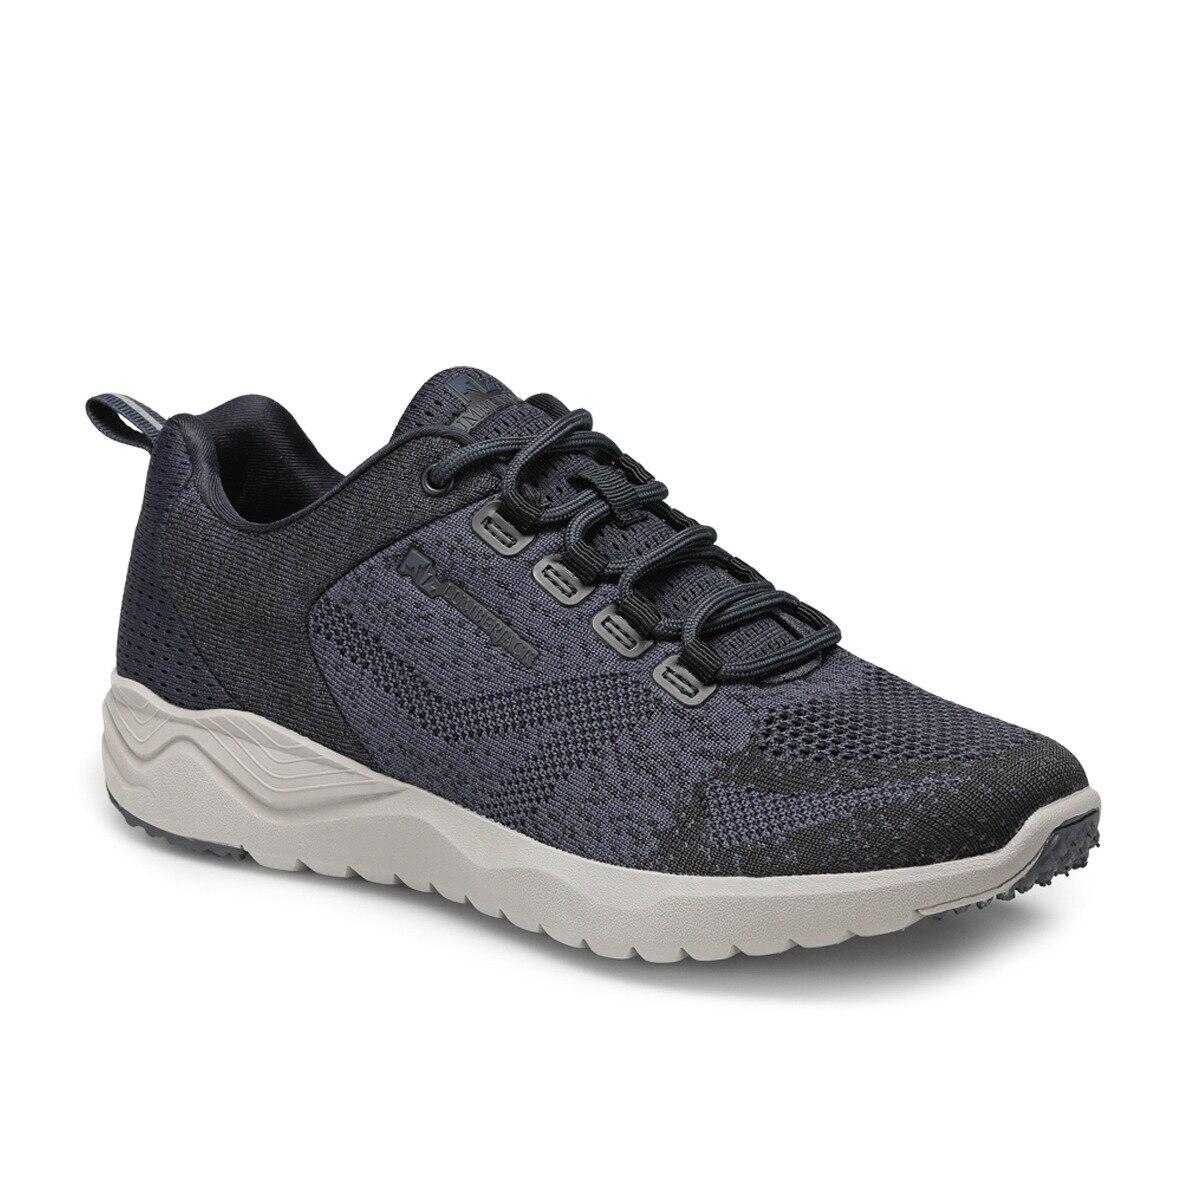 FLO MAXIMUS Navy Blue Men 'S Sneaker Shoes LUMBERJACK